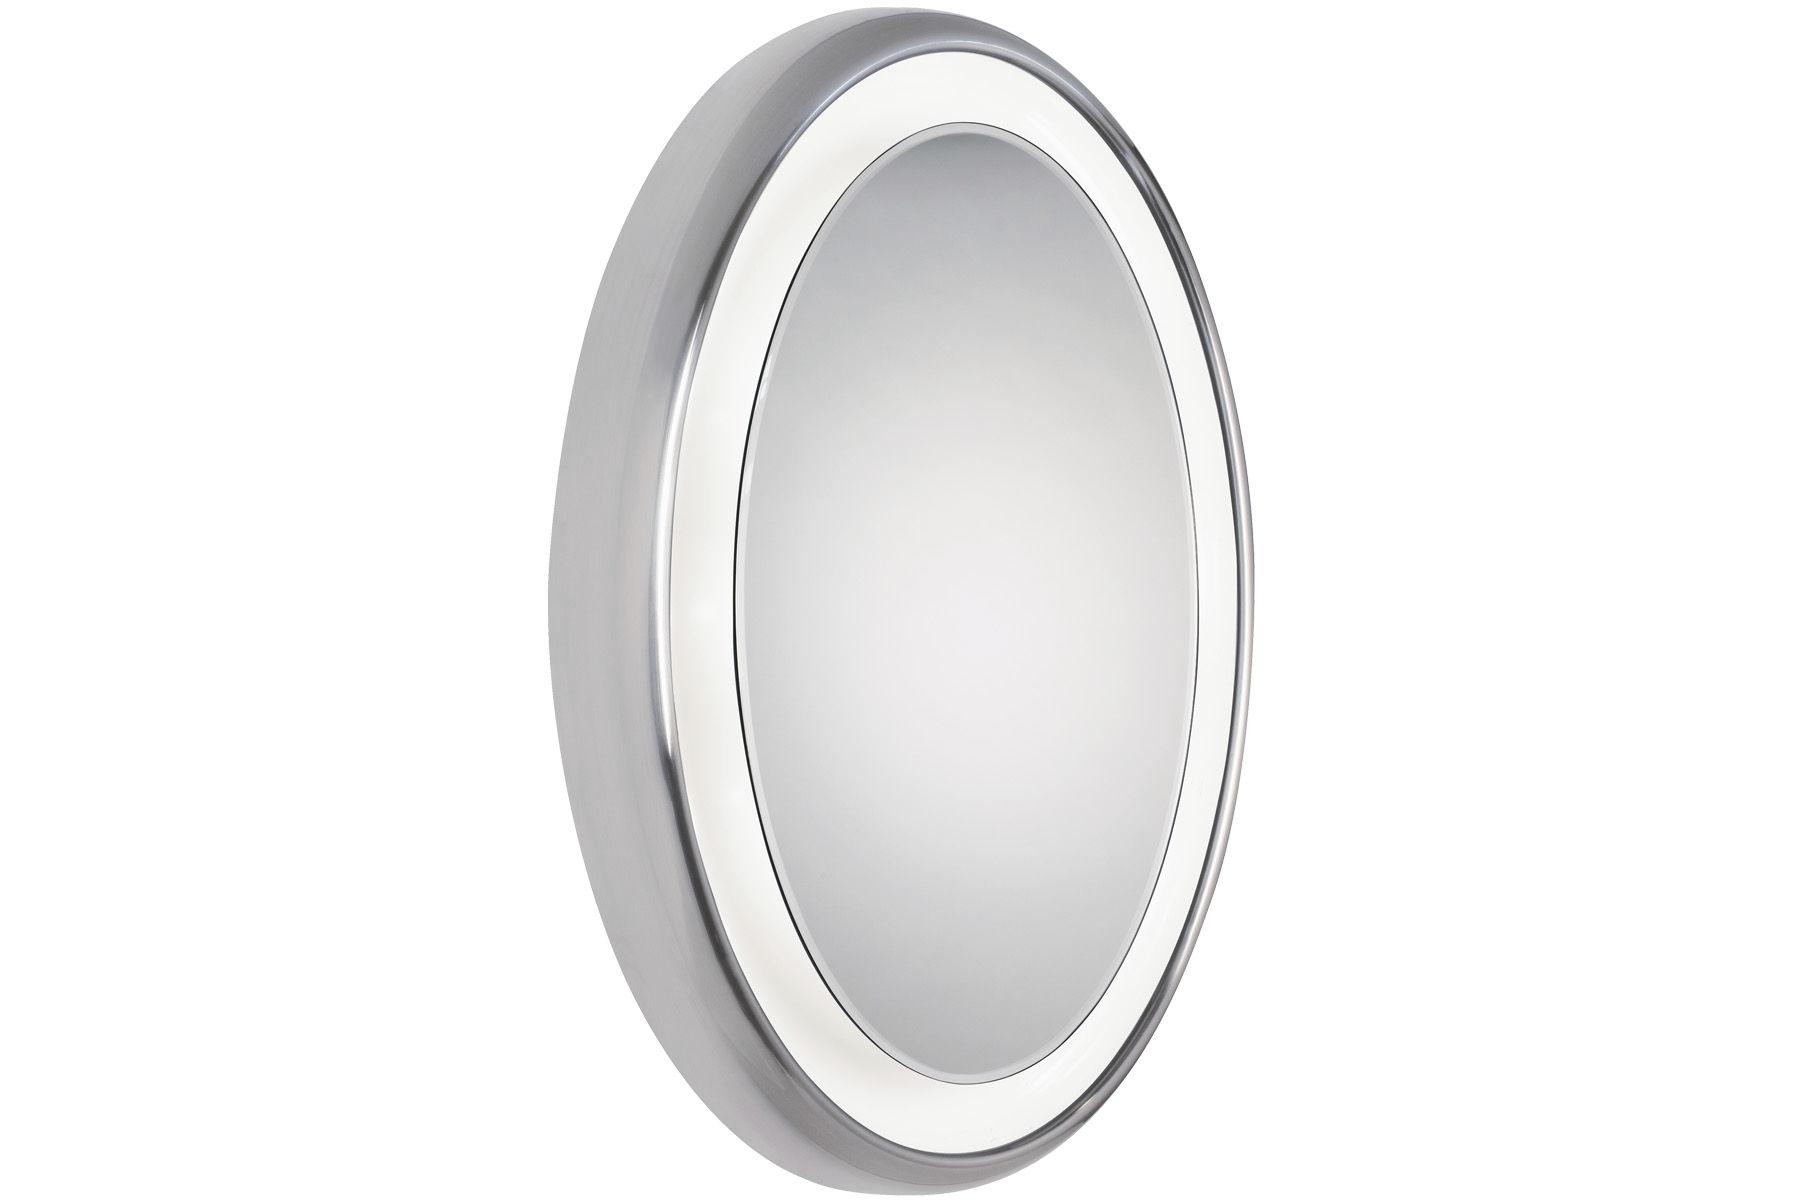 Wall mounted mirror contemporary oval bathroom TIGRIS